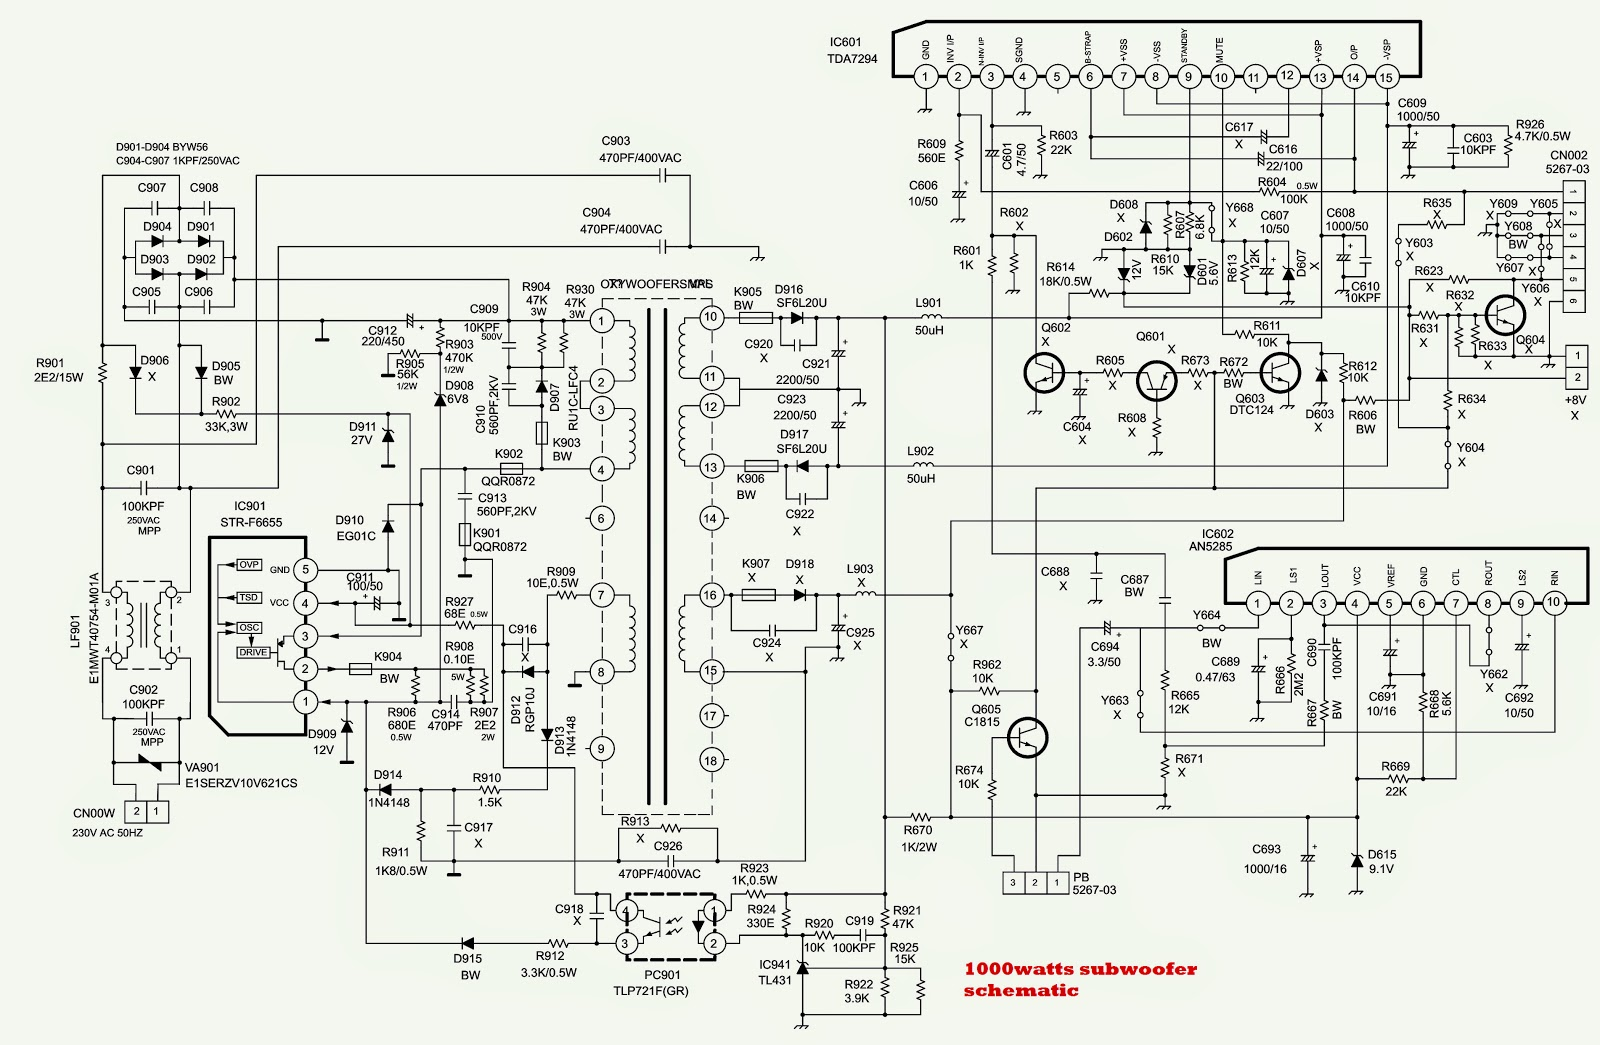 medium resolution of b w zeppelin circuit diagram wiring diagram datasource b w zeppelin circuit diagram